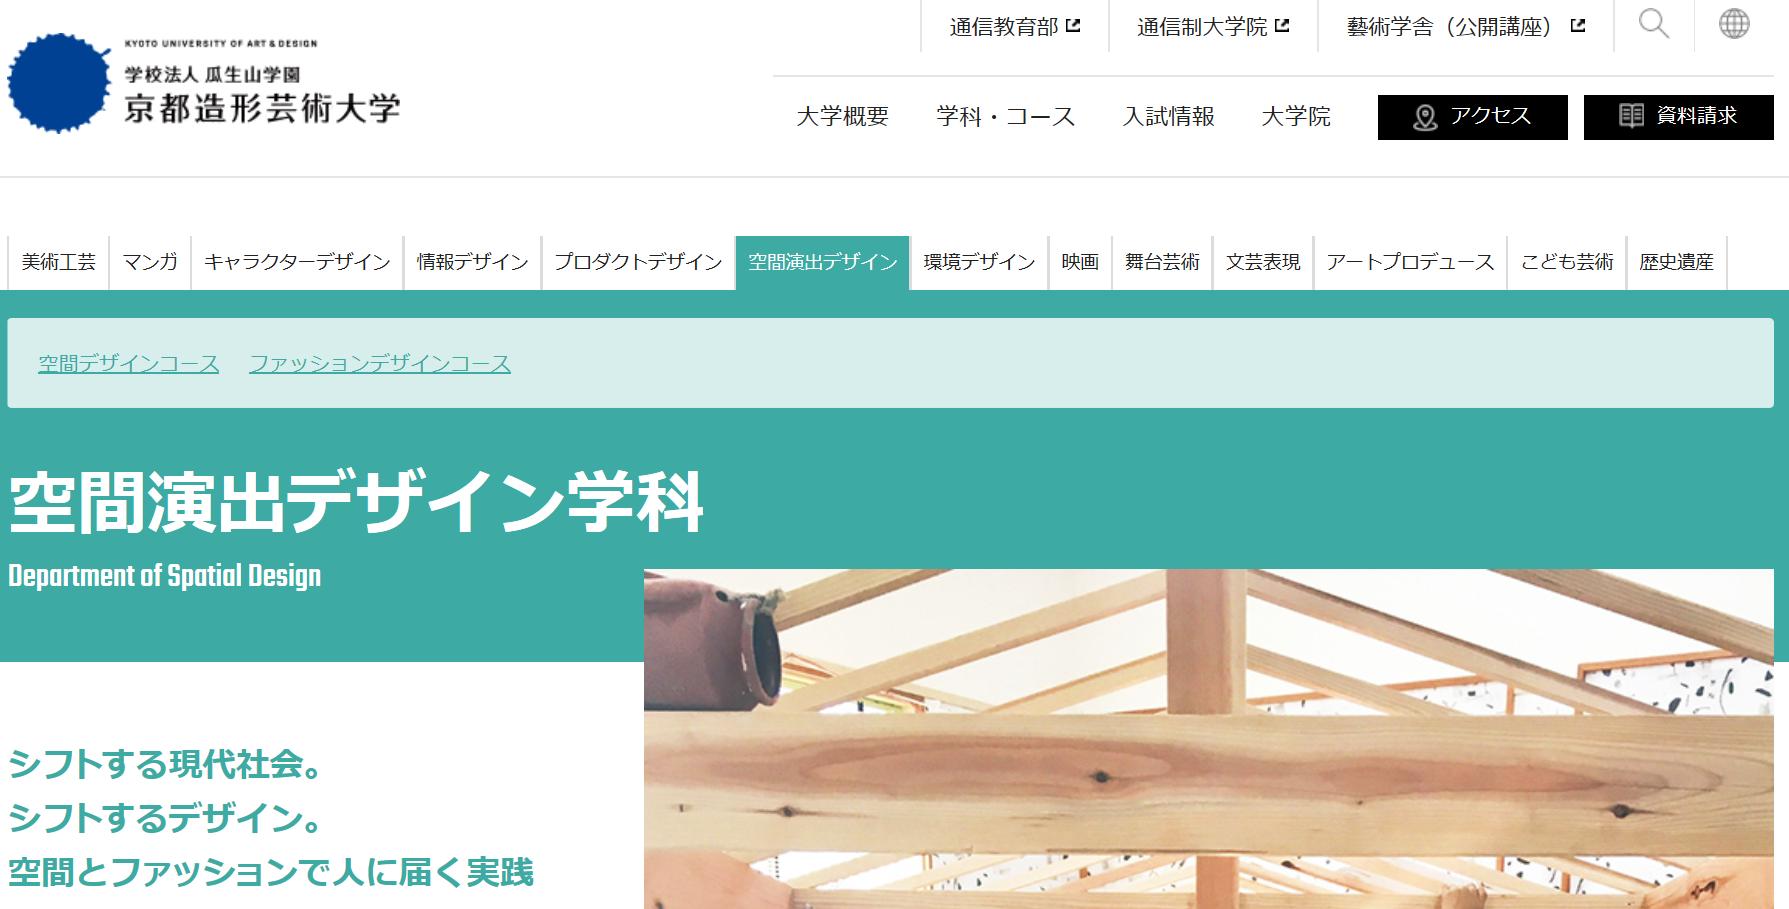 京都造形芸術大学の評判・口コミ【空間演出デザイン学科編】